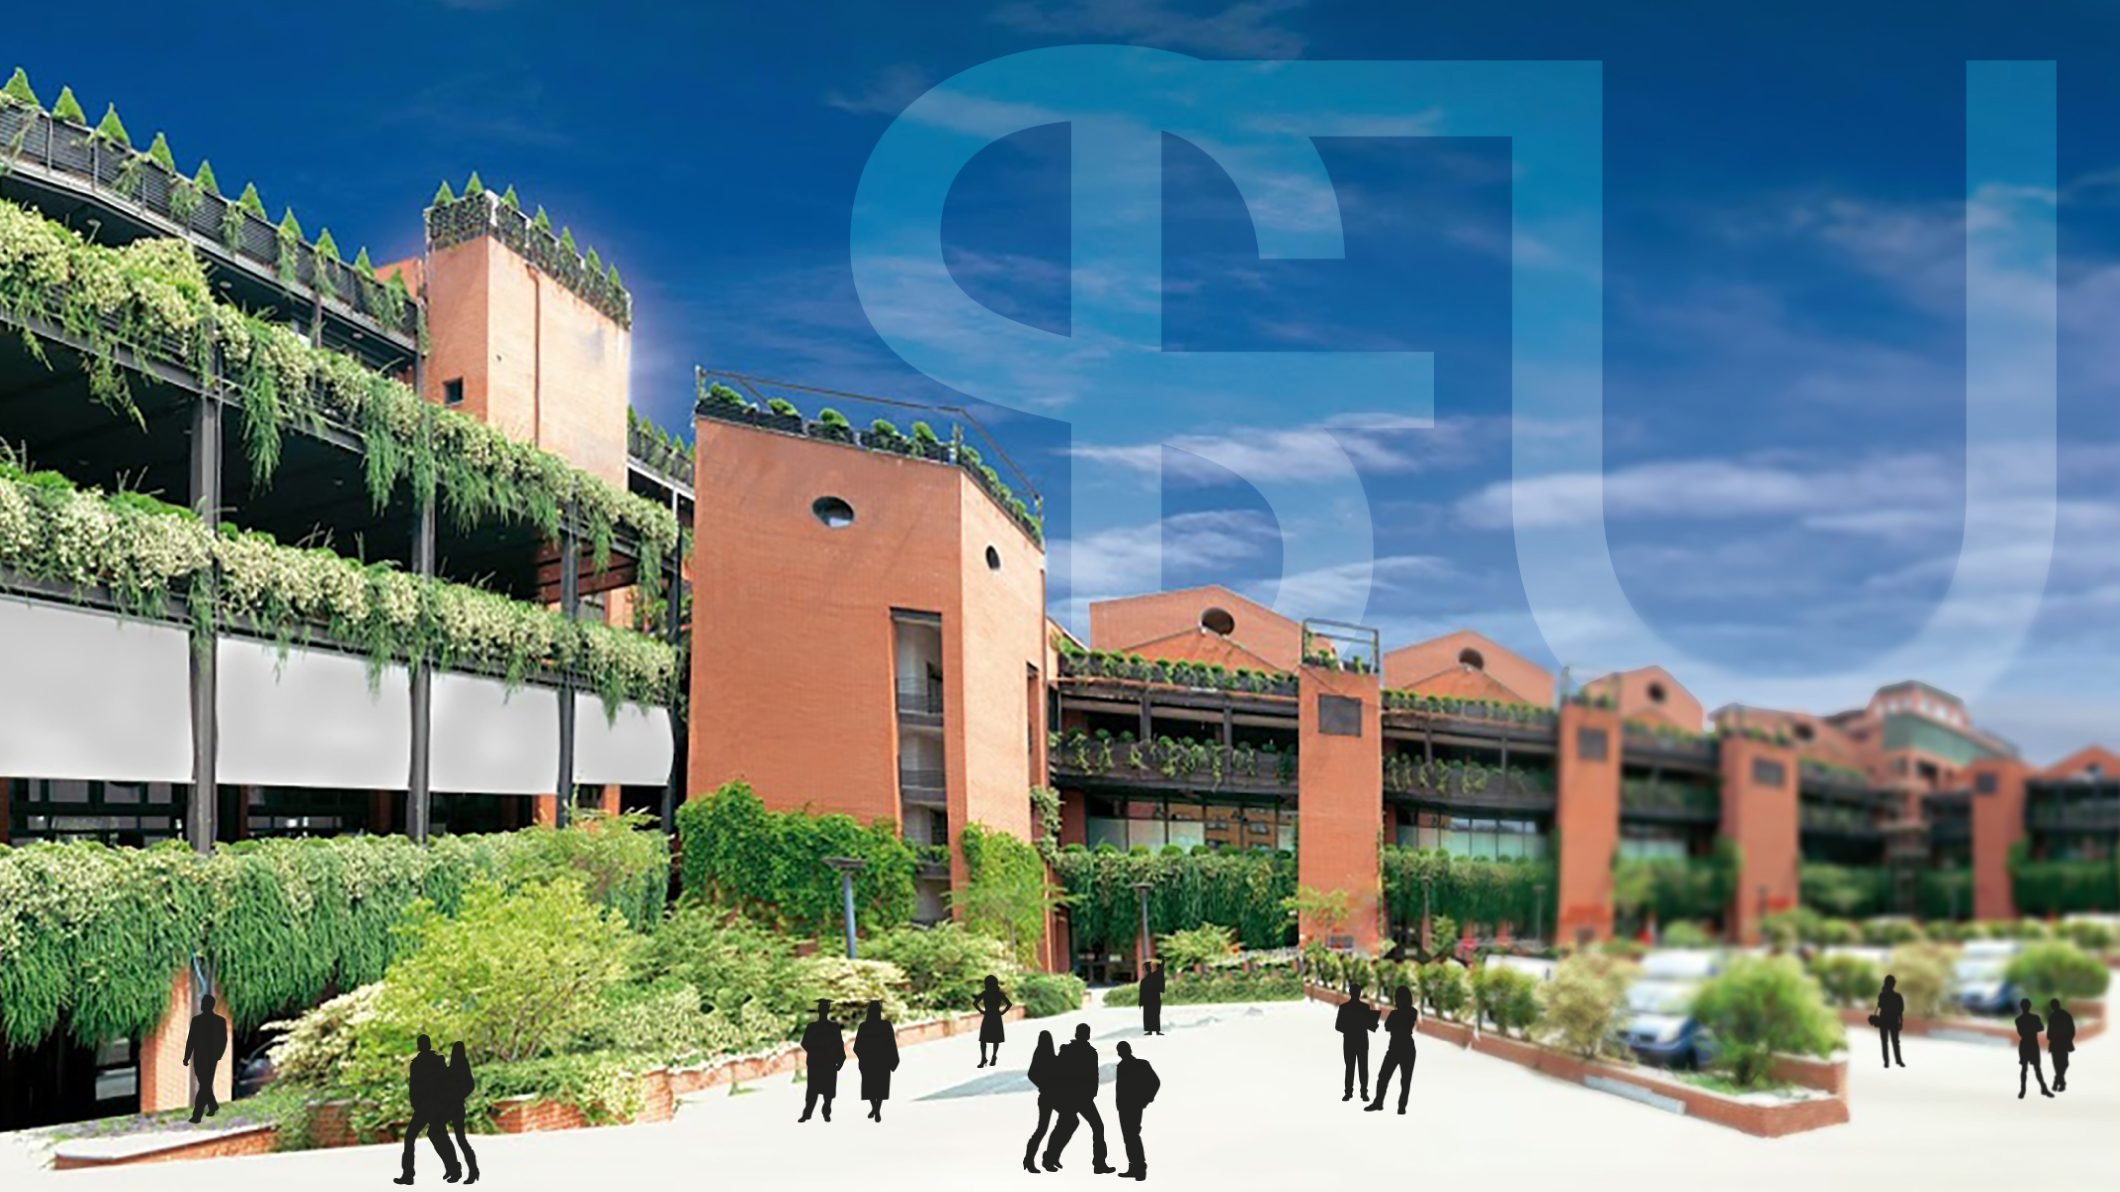 Sigmund Freud University Milano